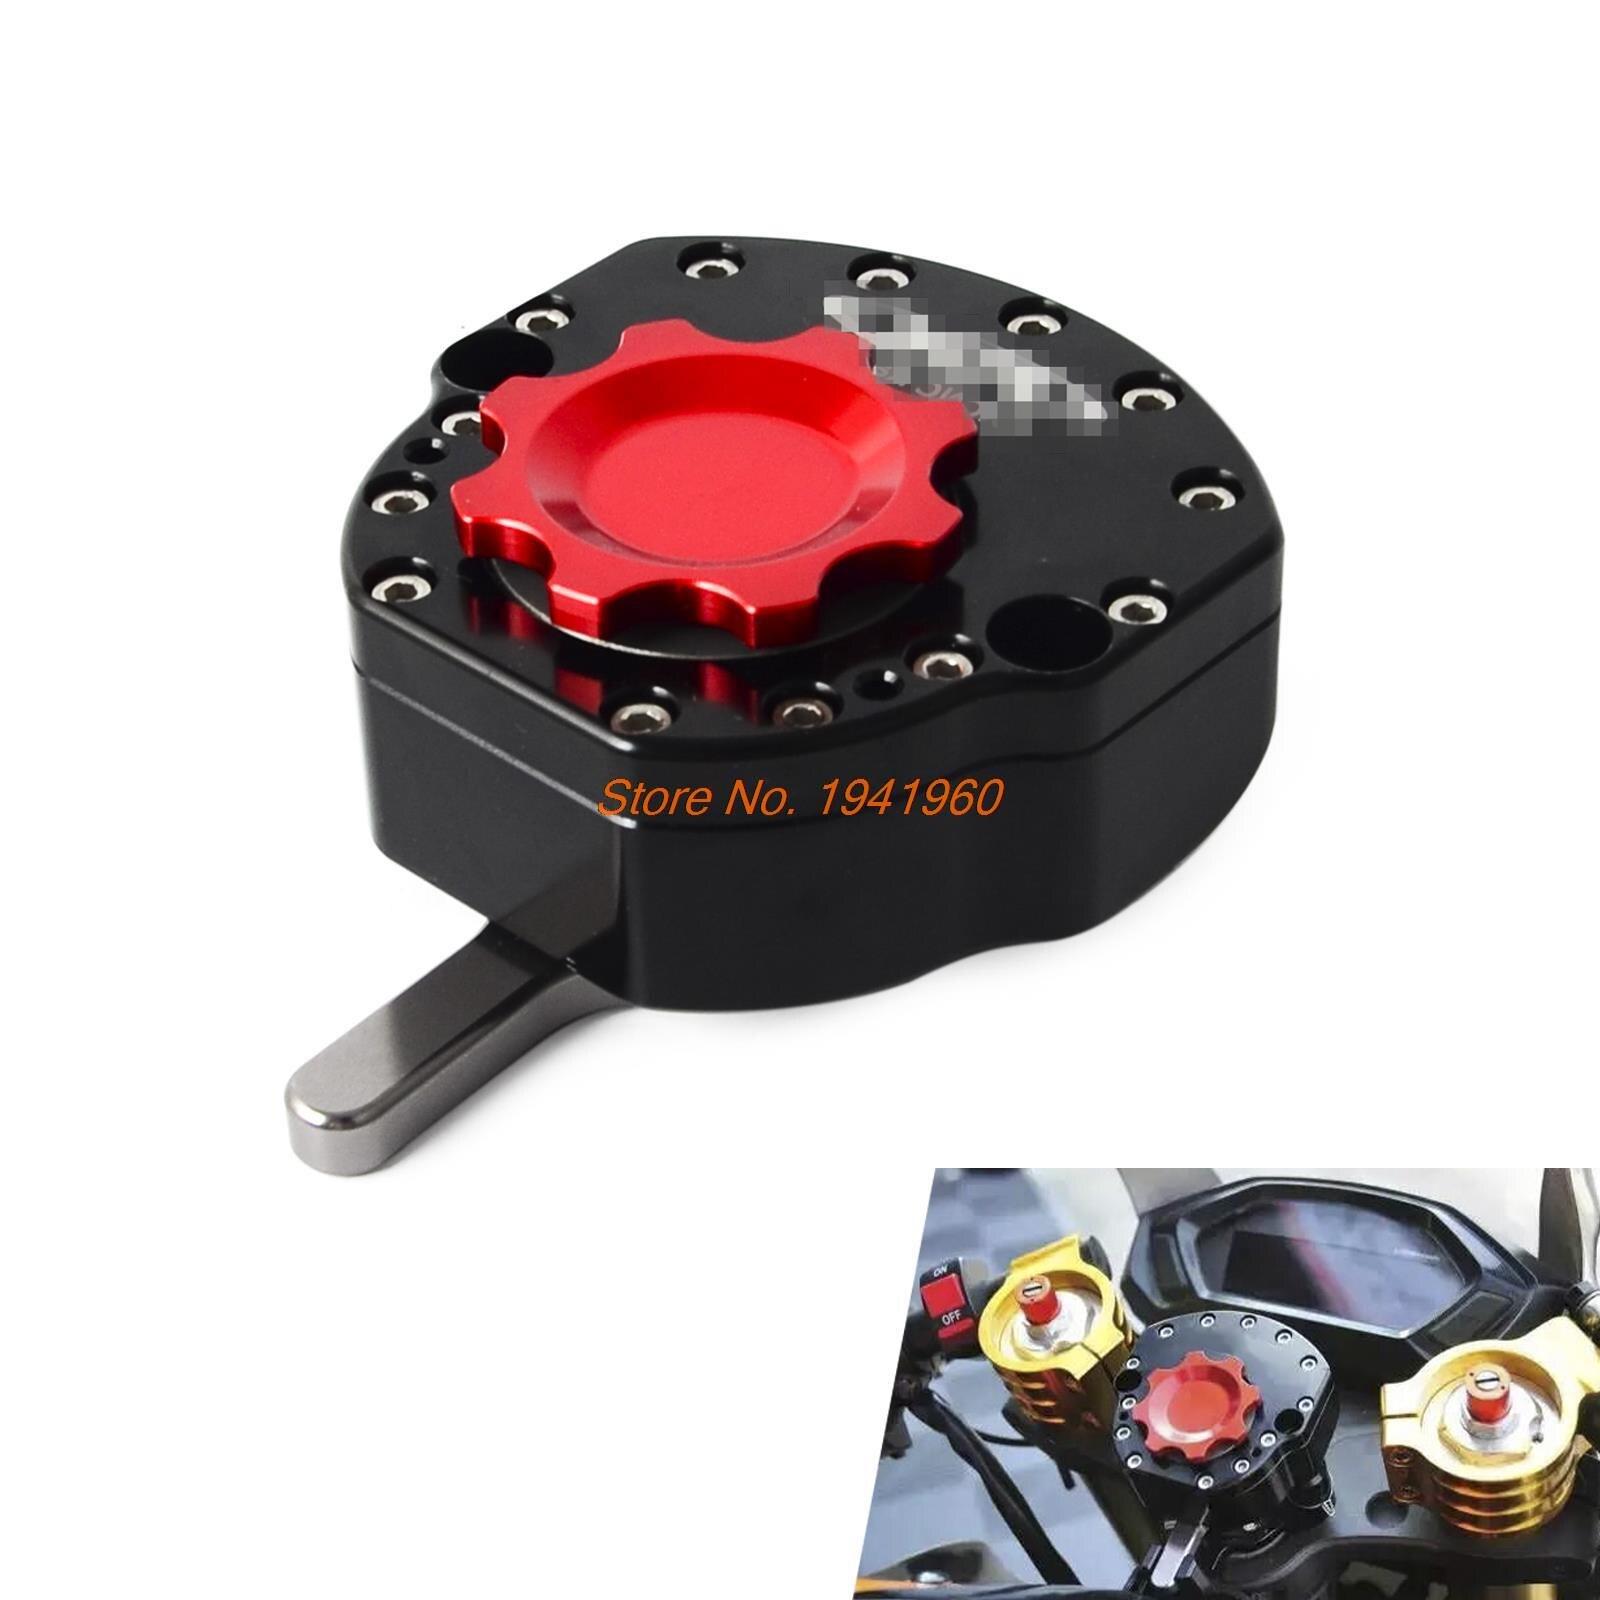 Universal CNC Steering Stabilizer Damper For Honda CBR600RR CBR 900RR 1000RR 929 954 Kawasaki EX250R 300R Ninja ZX636 ZX 10R 14R cnc steering stabilizer damper for kawasaki ex250r ninja 08 12 ex300r 13 15 zx636 13 14 zx6r zx 6r 07 12 zx10r zx 10r 04 13